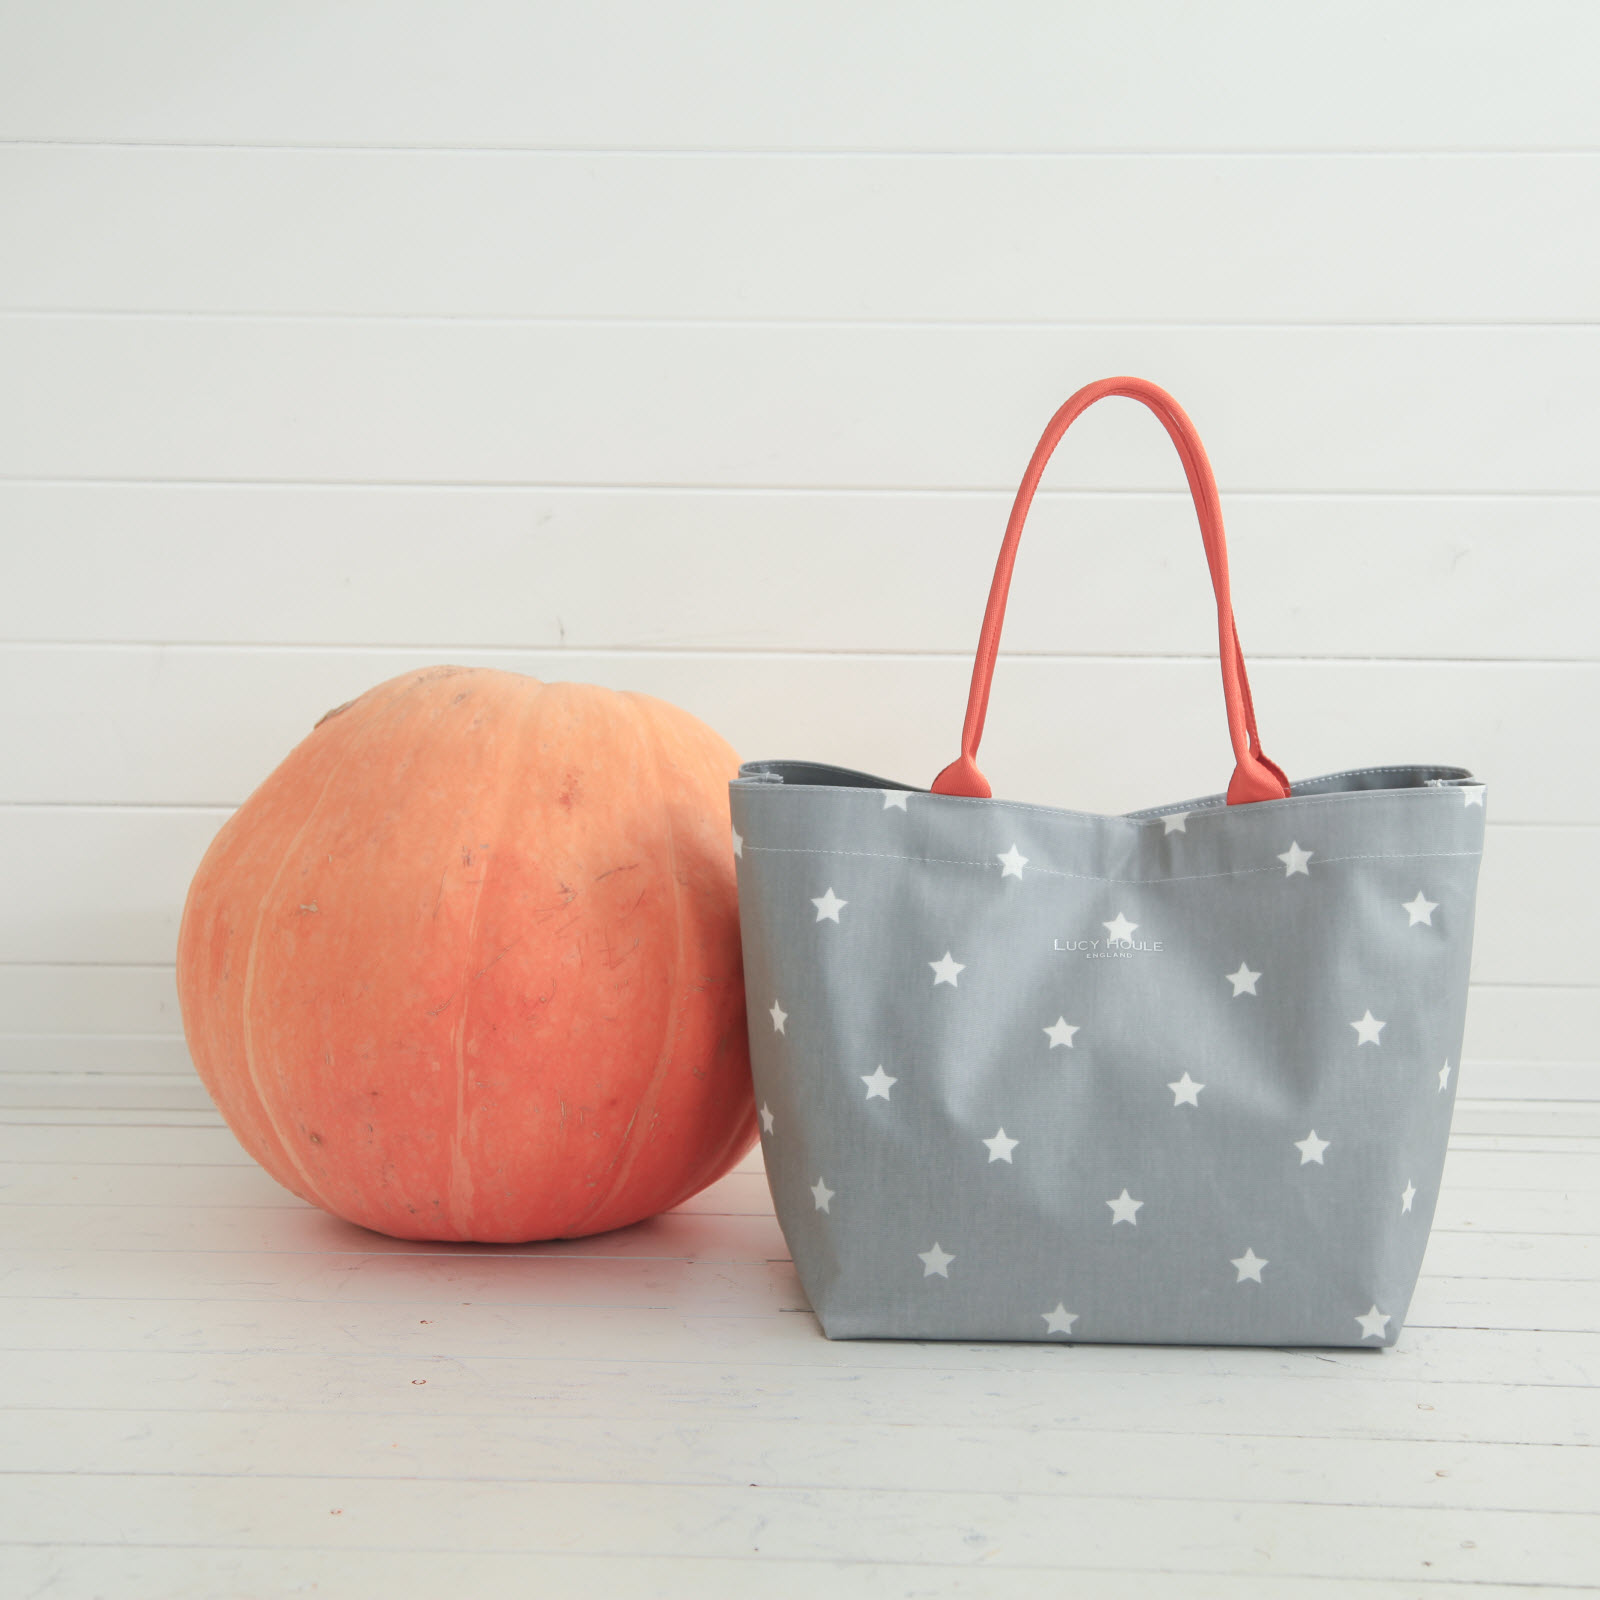 Grey & White Star Medium Tote Bag with Orange Handles